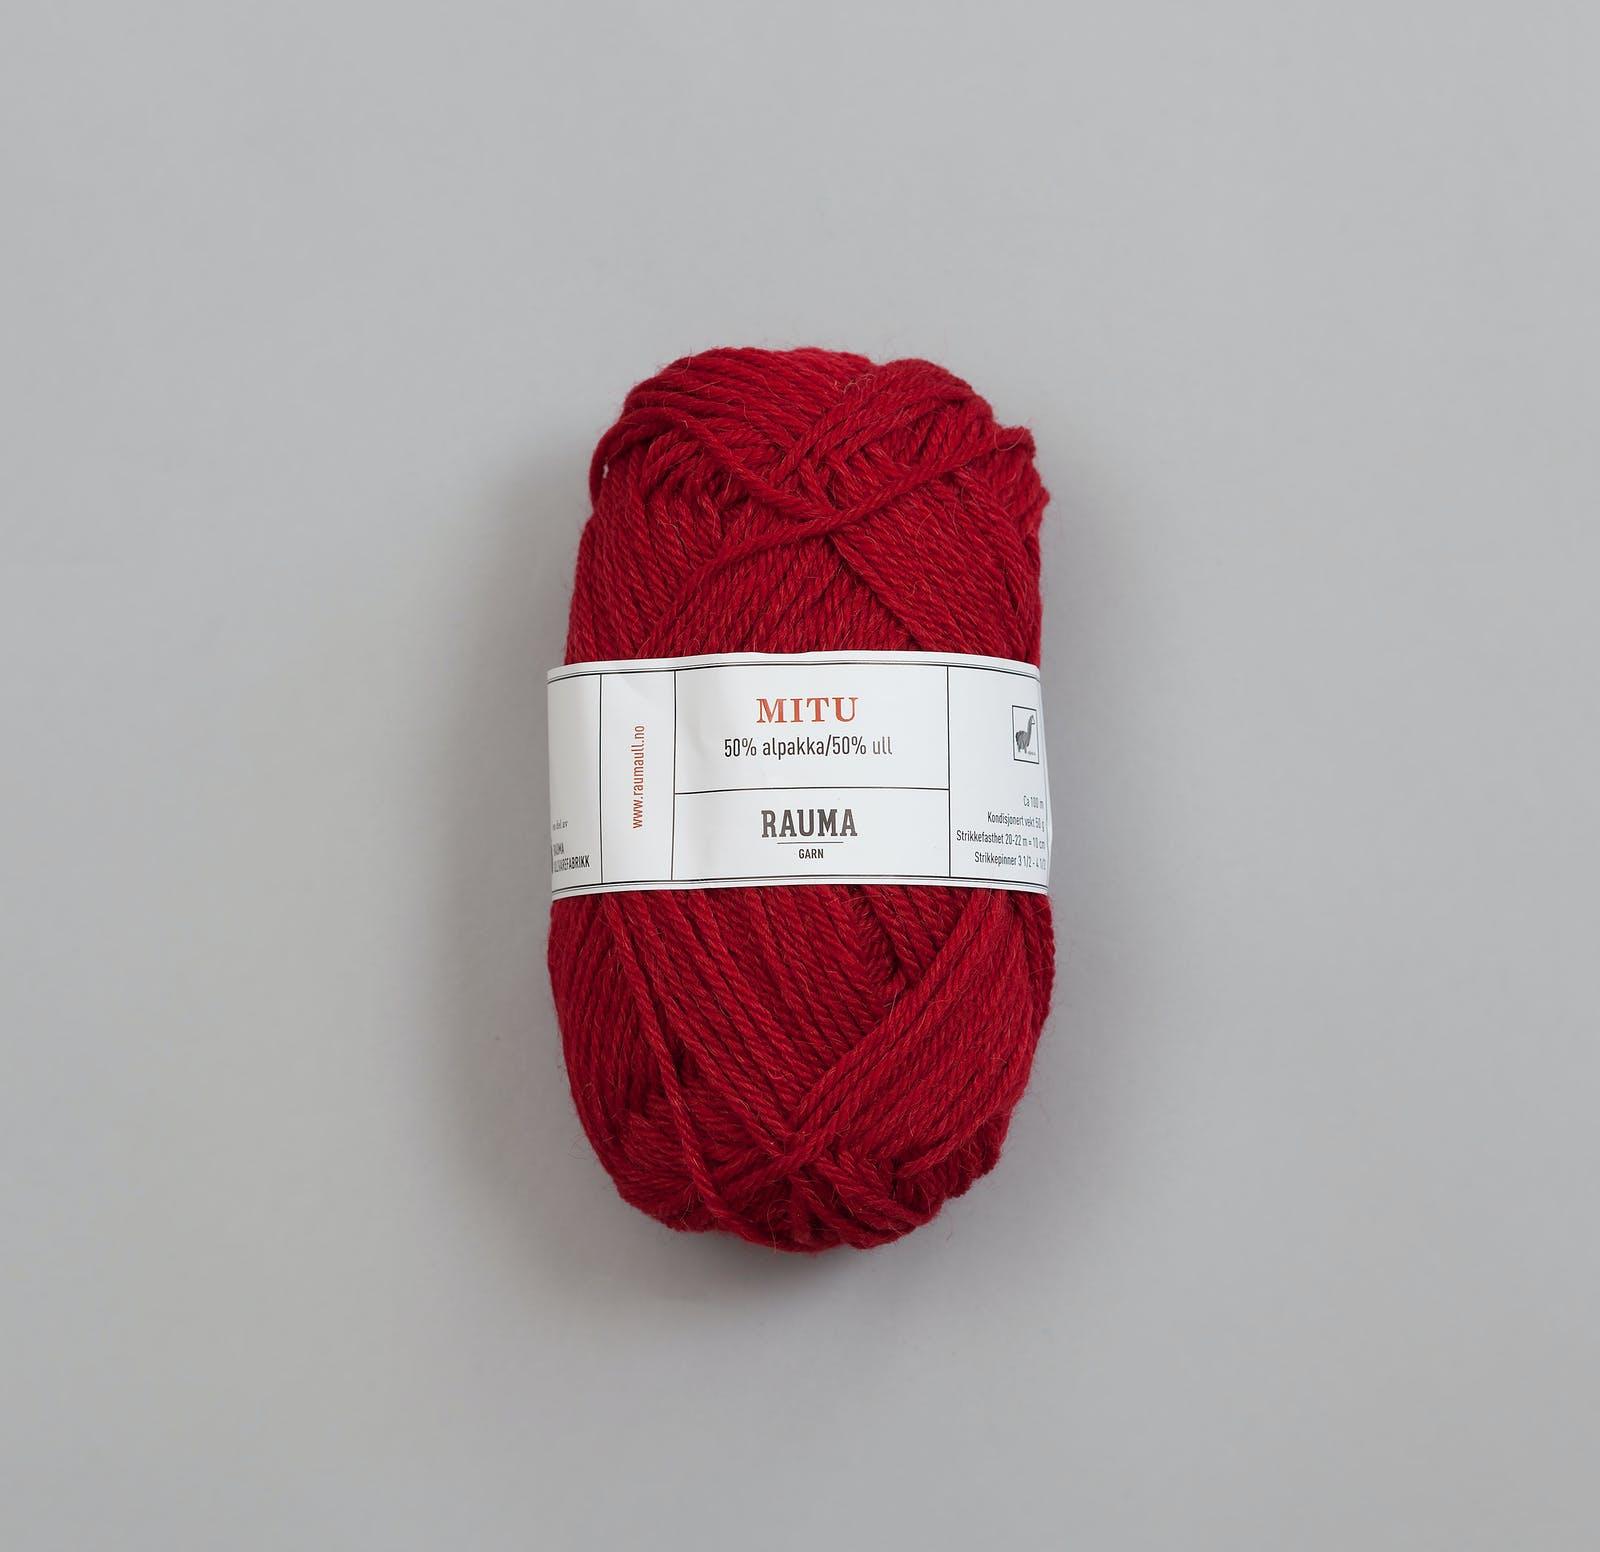 6085 Dyp rød - Mitu